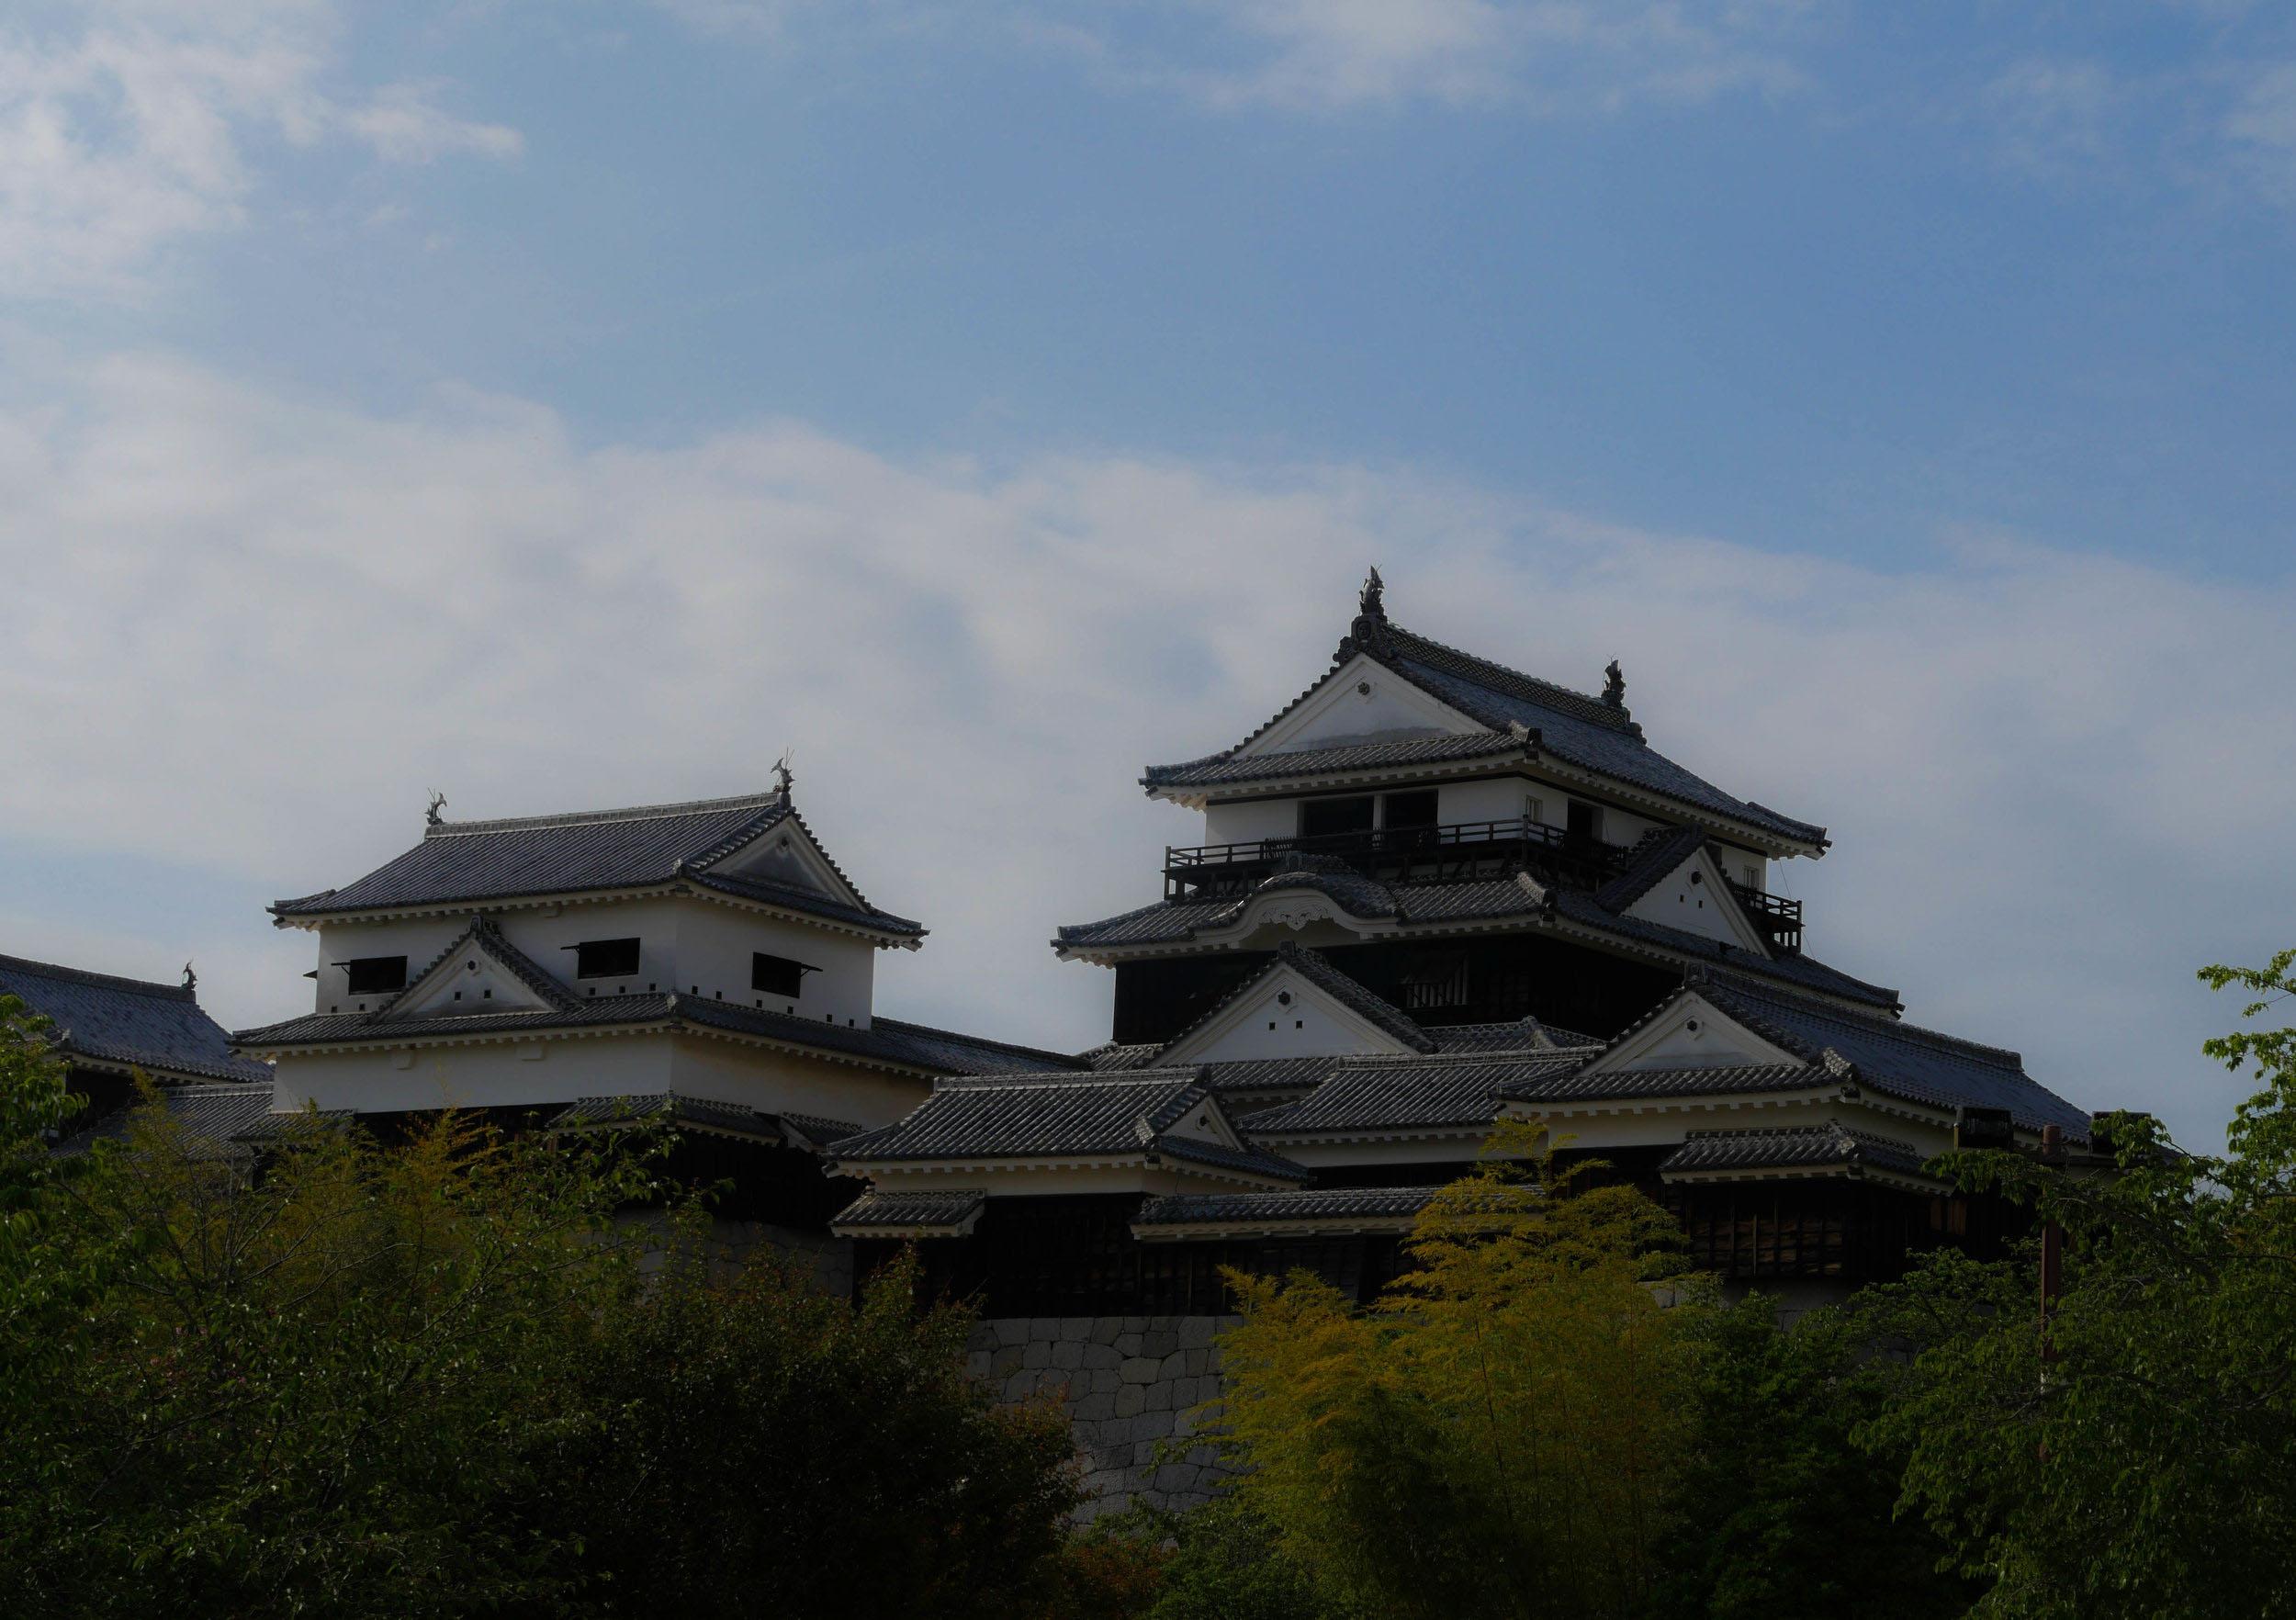 matsuyama-dougo-onsen-13.jpg